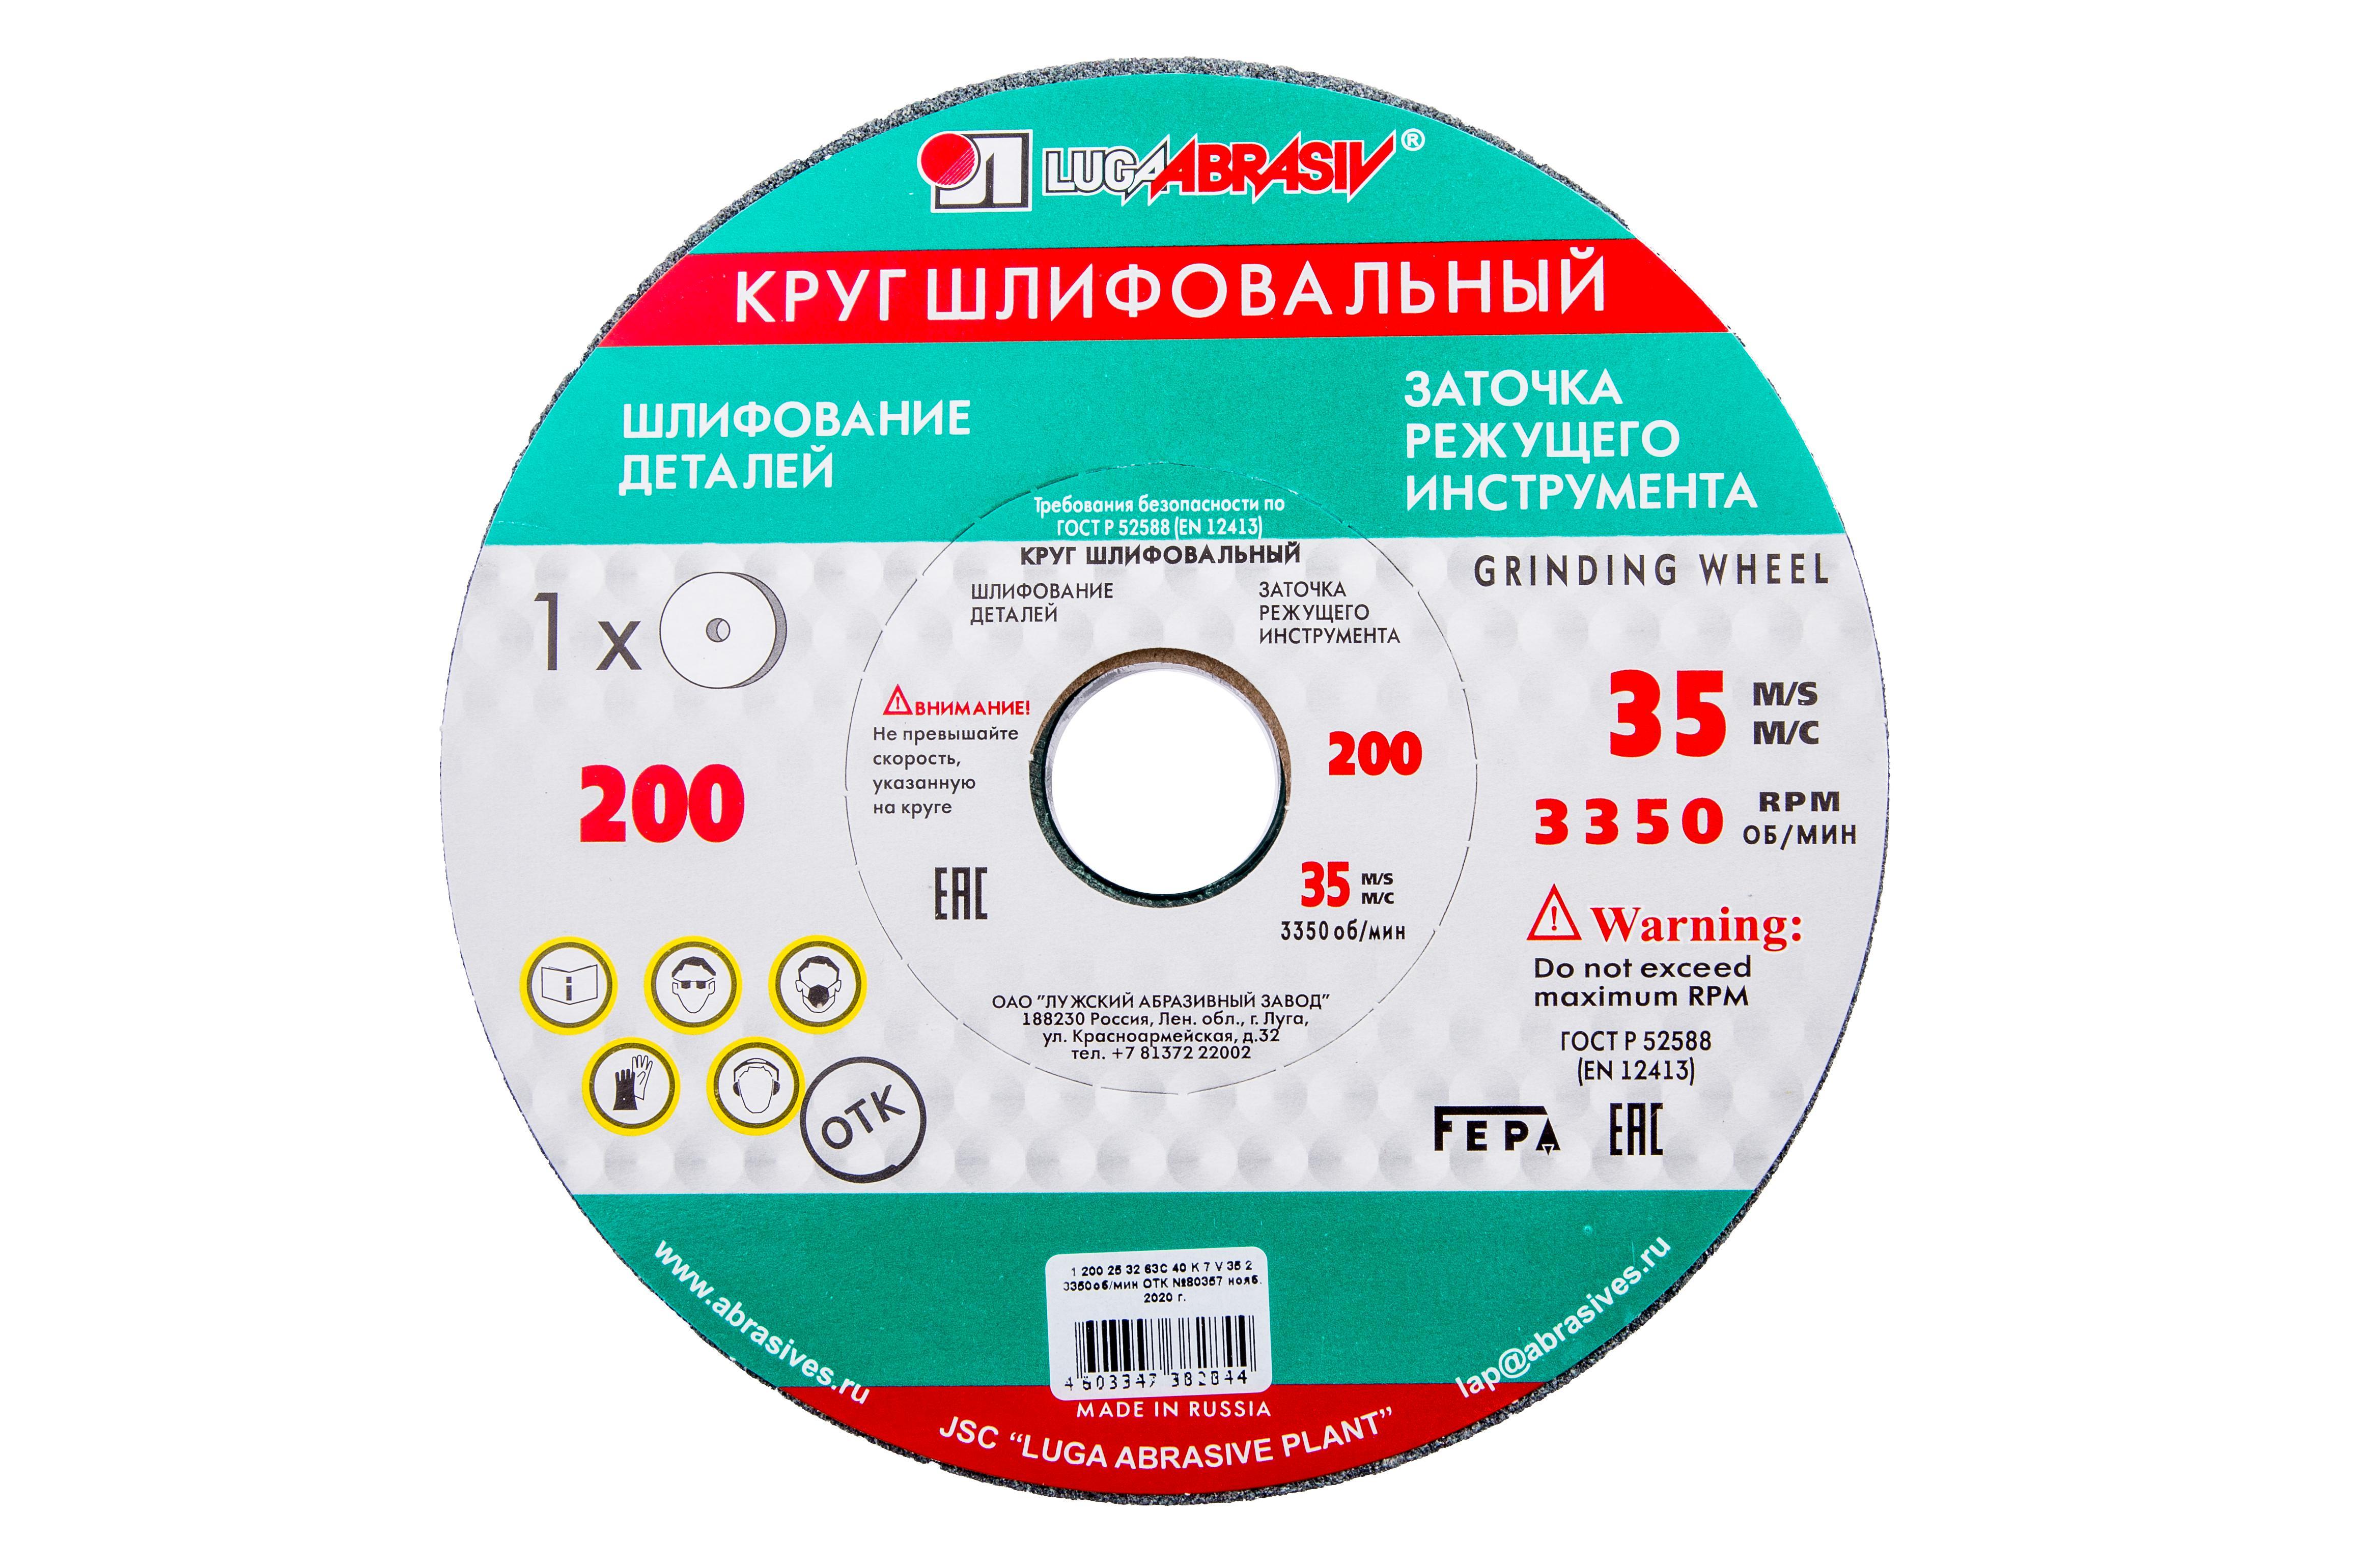 Круг шлифовальный ЛУГА-АБРАЗИВ 1 200 Х 25 Х 32 63С 40 k,l